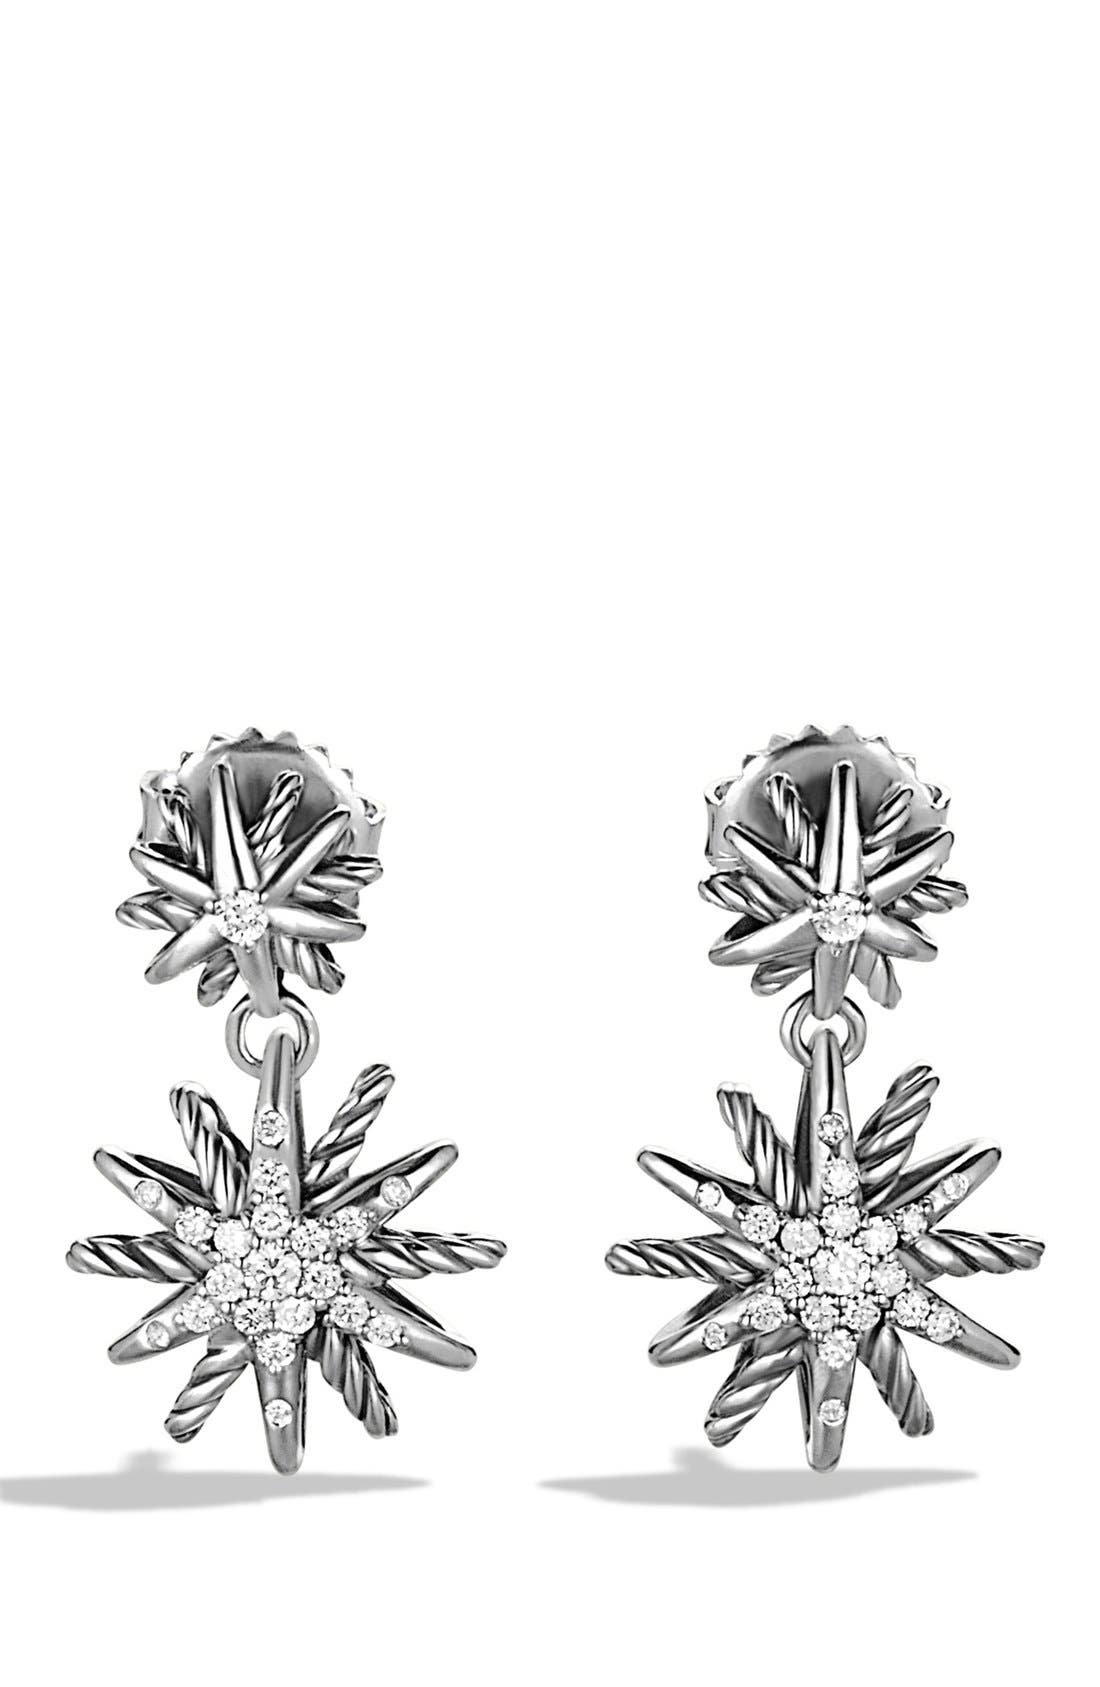 Main Image - David Yurman 'Starburst' Double-Drop Earrings with Diamonds